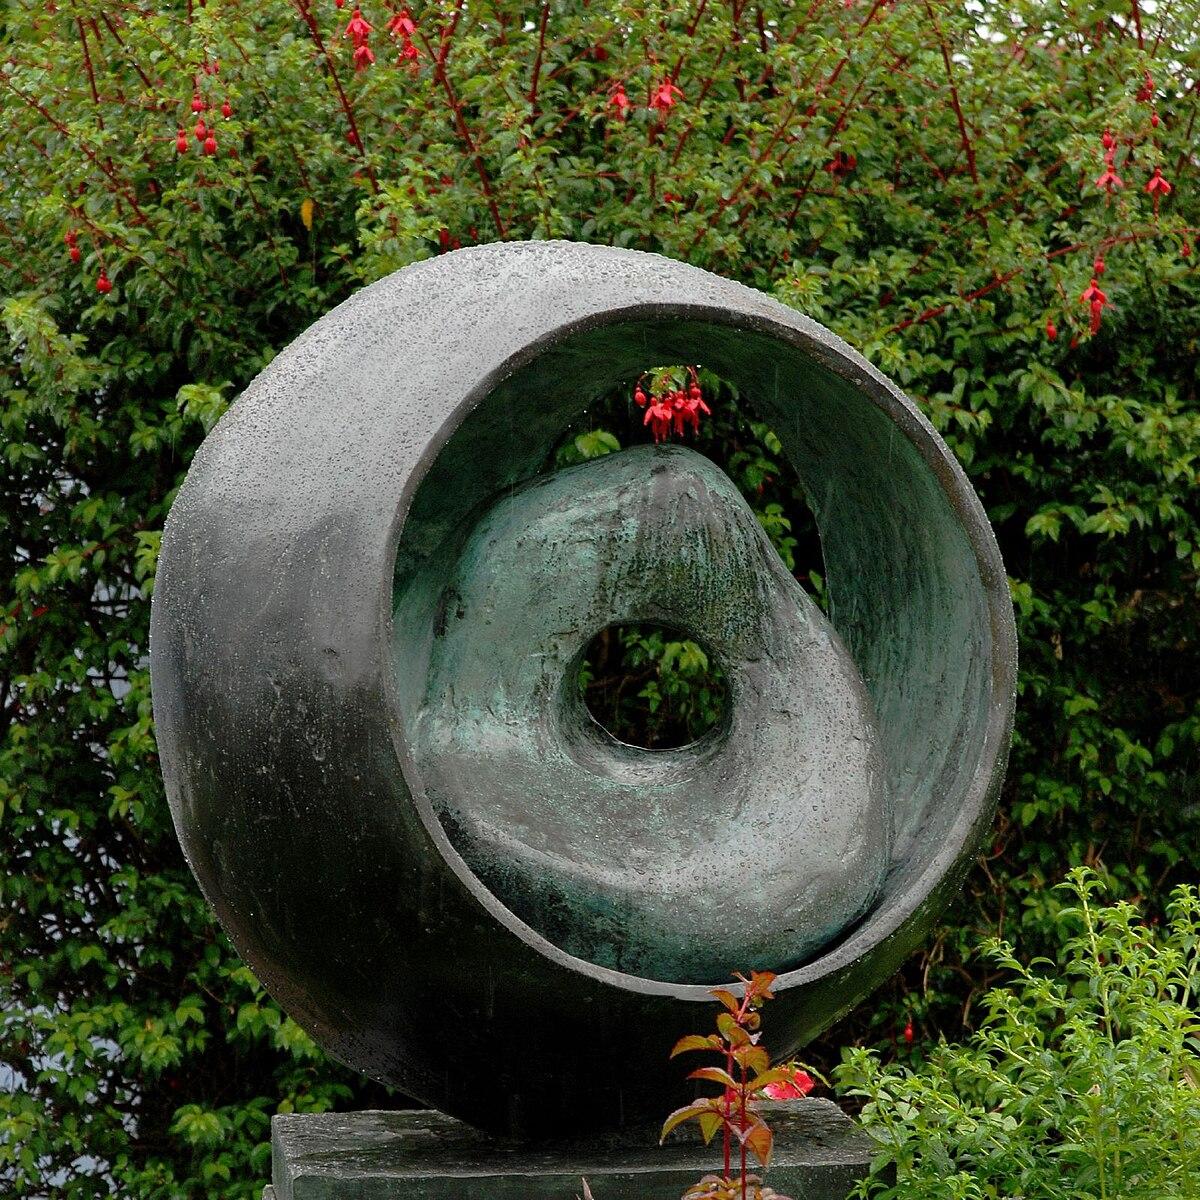 Barbara Hepworth Museum and Sculpture Garden  Wikipedia